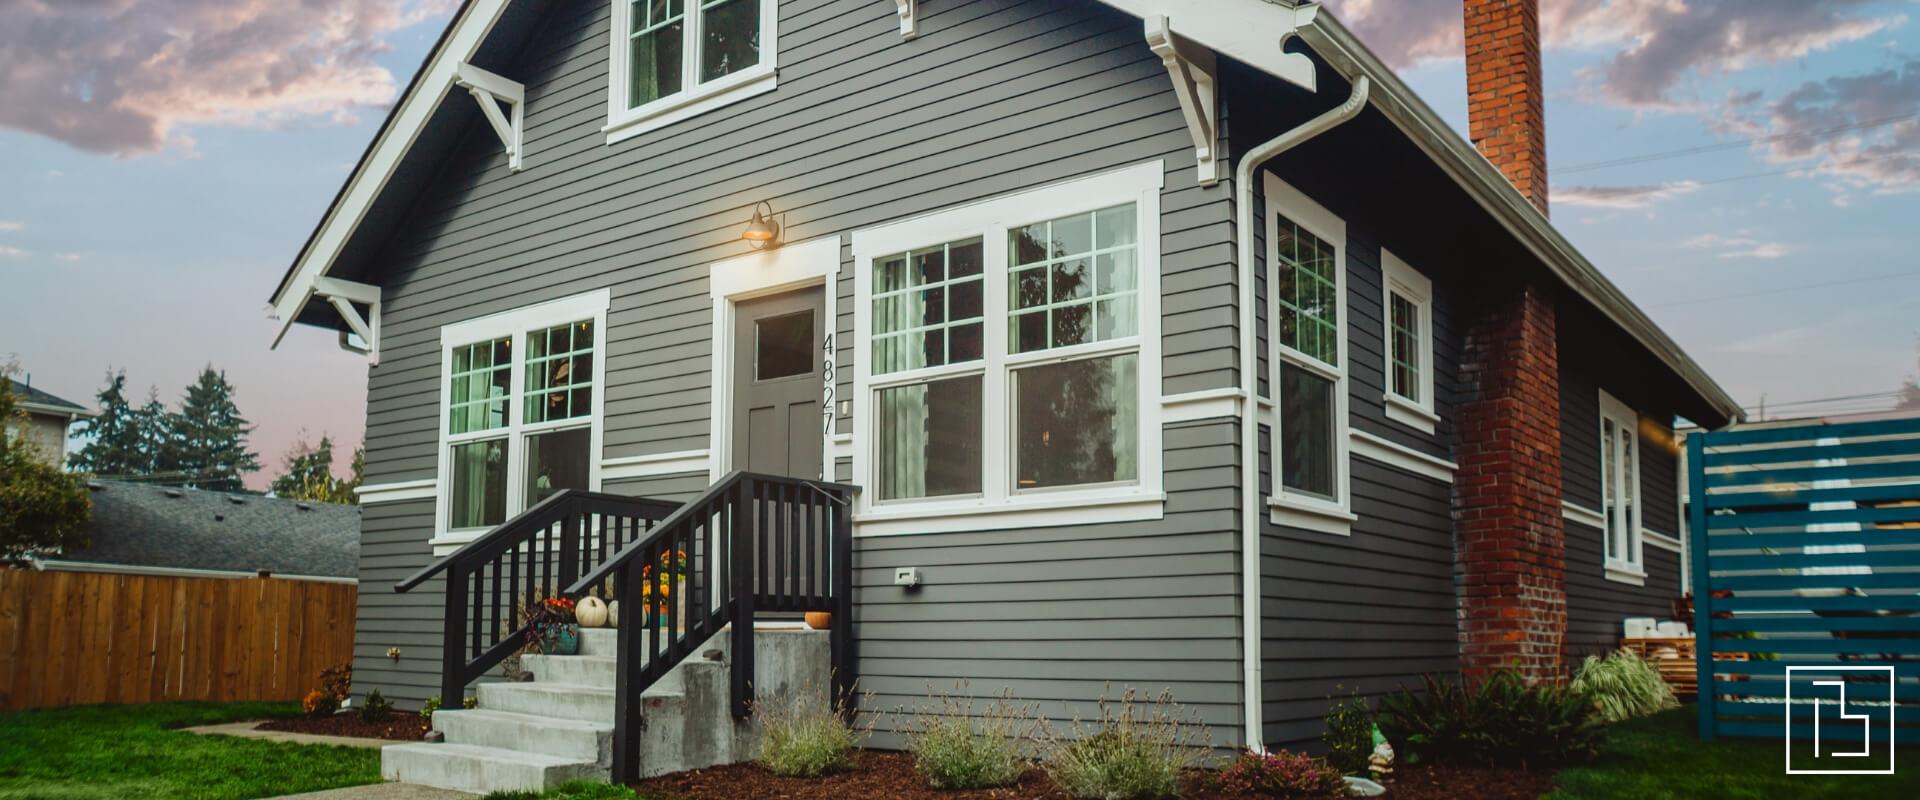 Seattle Single-Family Zoning - Beachworks LLC